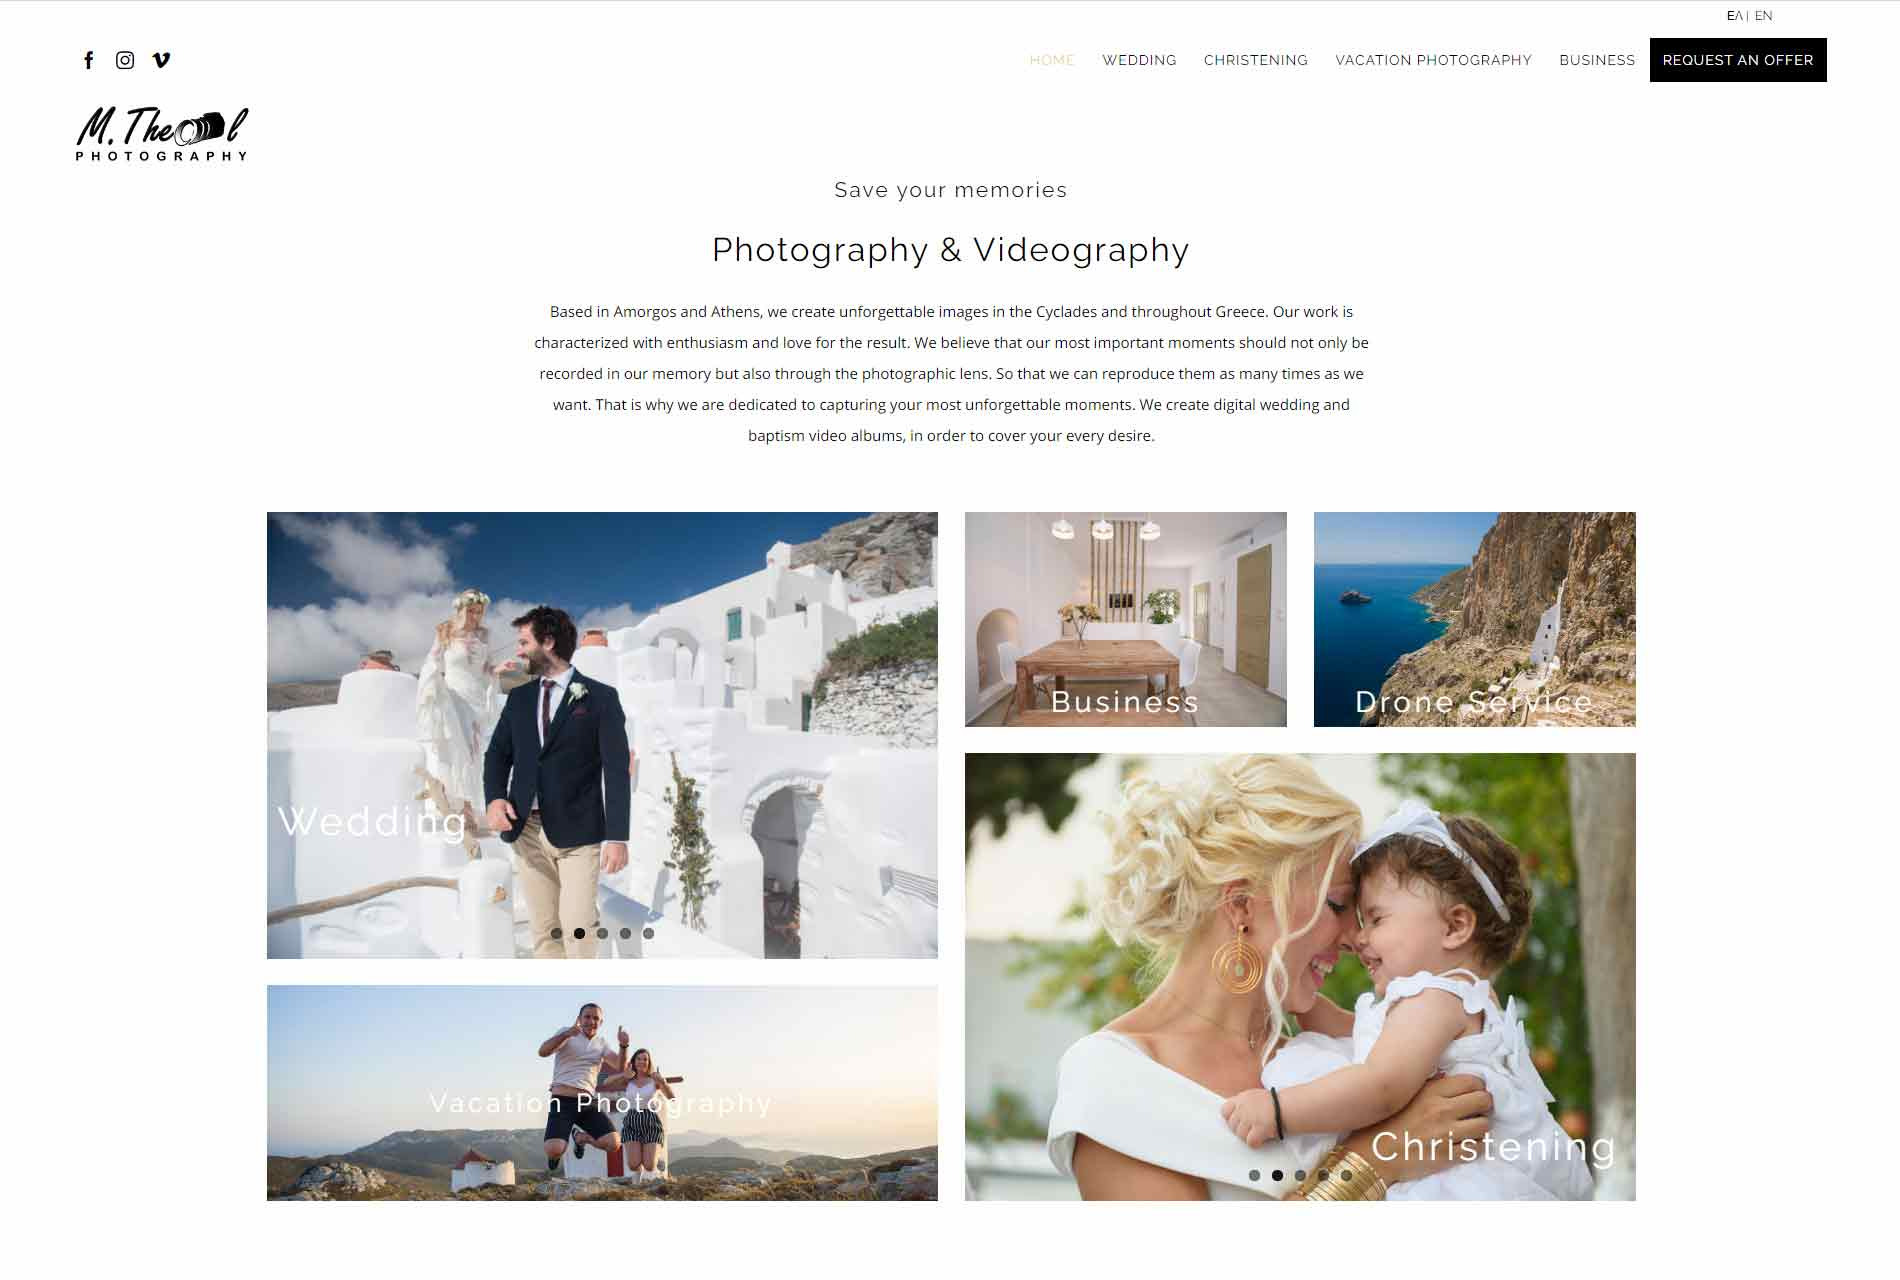 Web design Mtheol Photographer